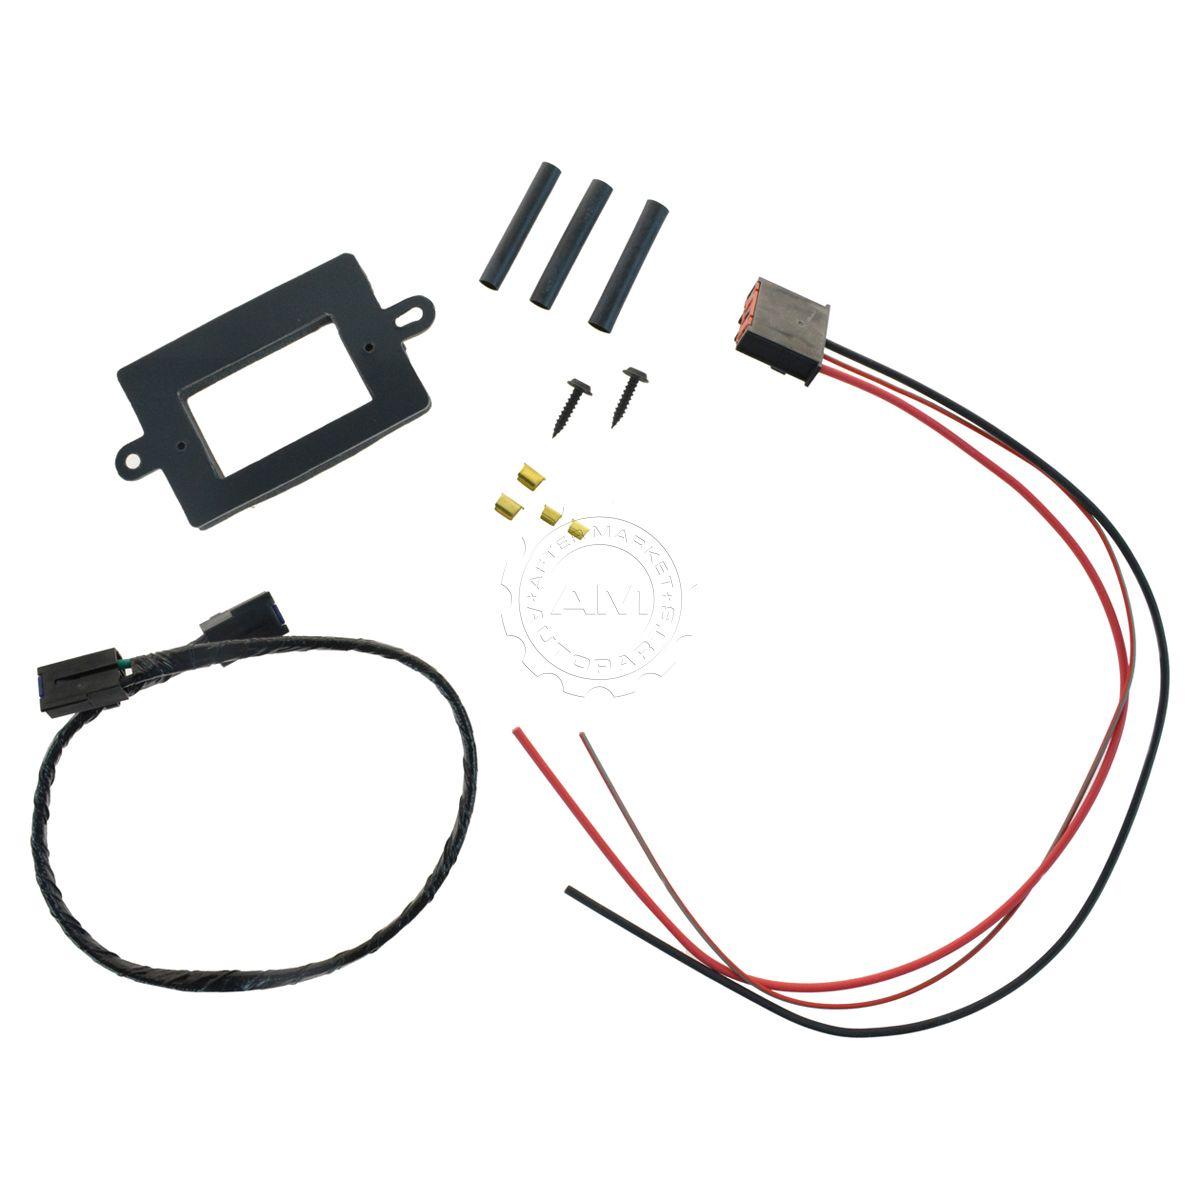 hight resolution of 2001 jeep grand cherokee blower motor resistor wiring harness